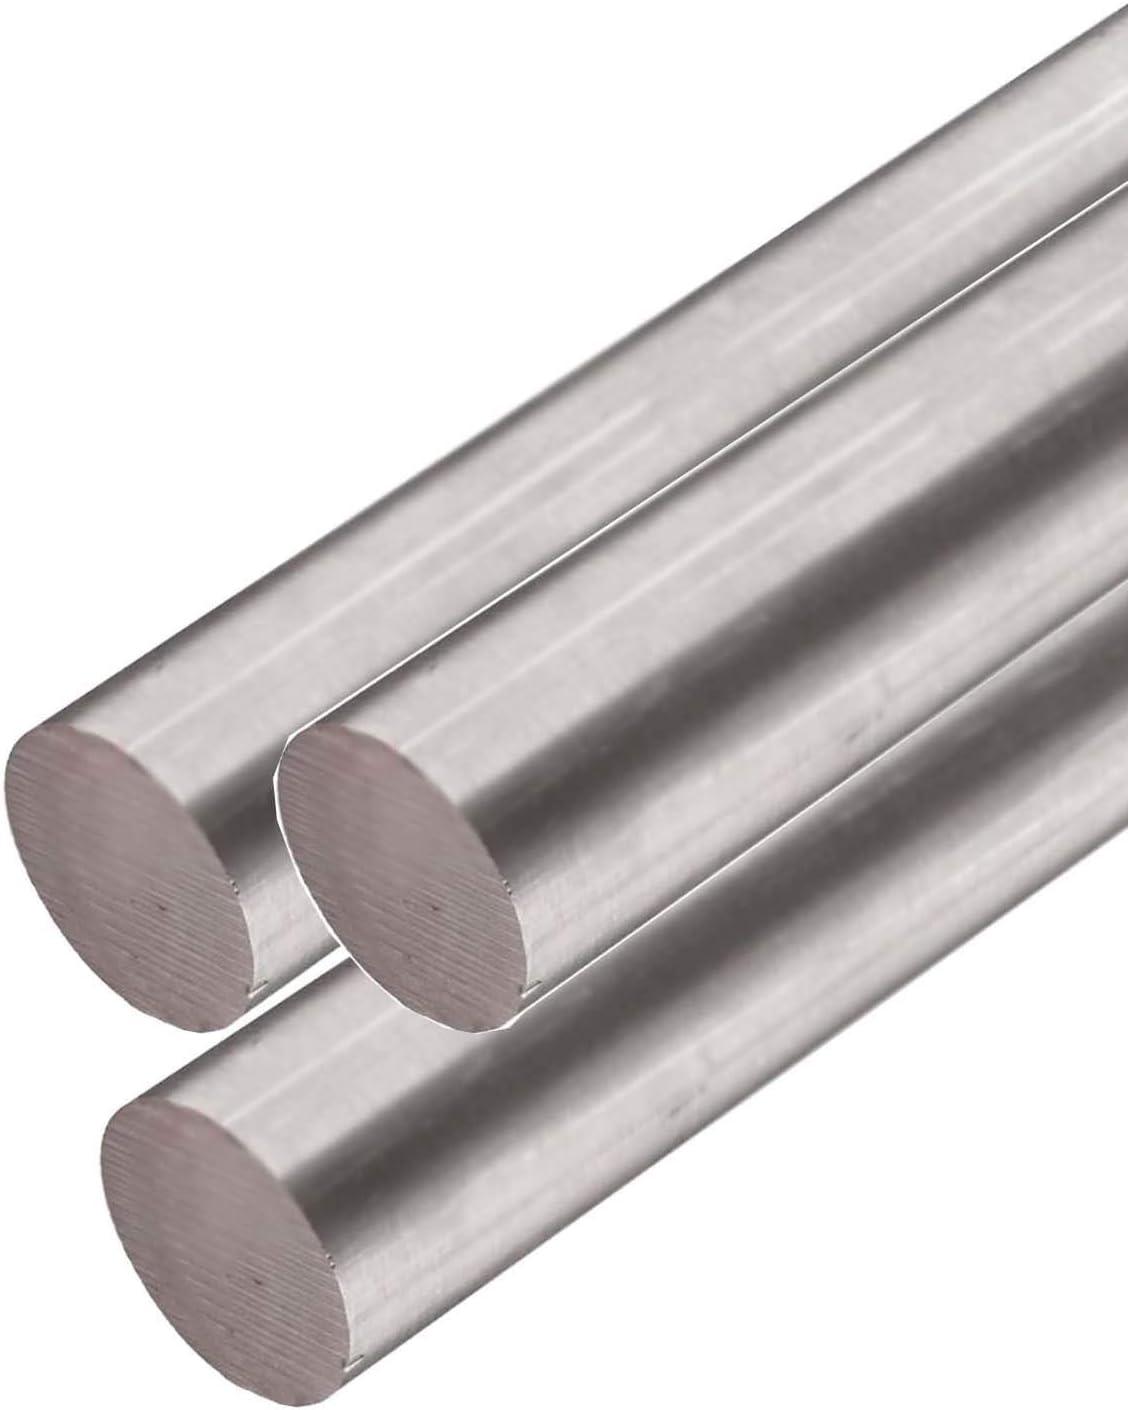 x 24 inches Online Metal Supply 12L14 CF Steel Round Rod 2.000 2 inch